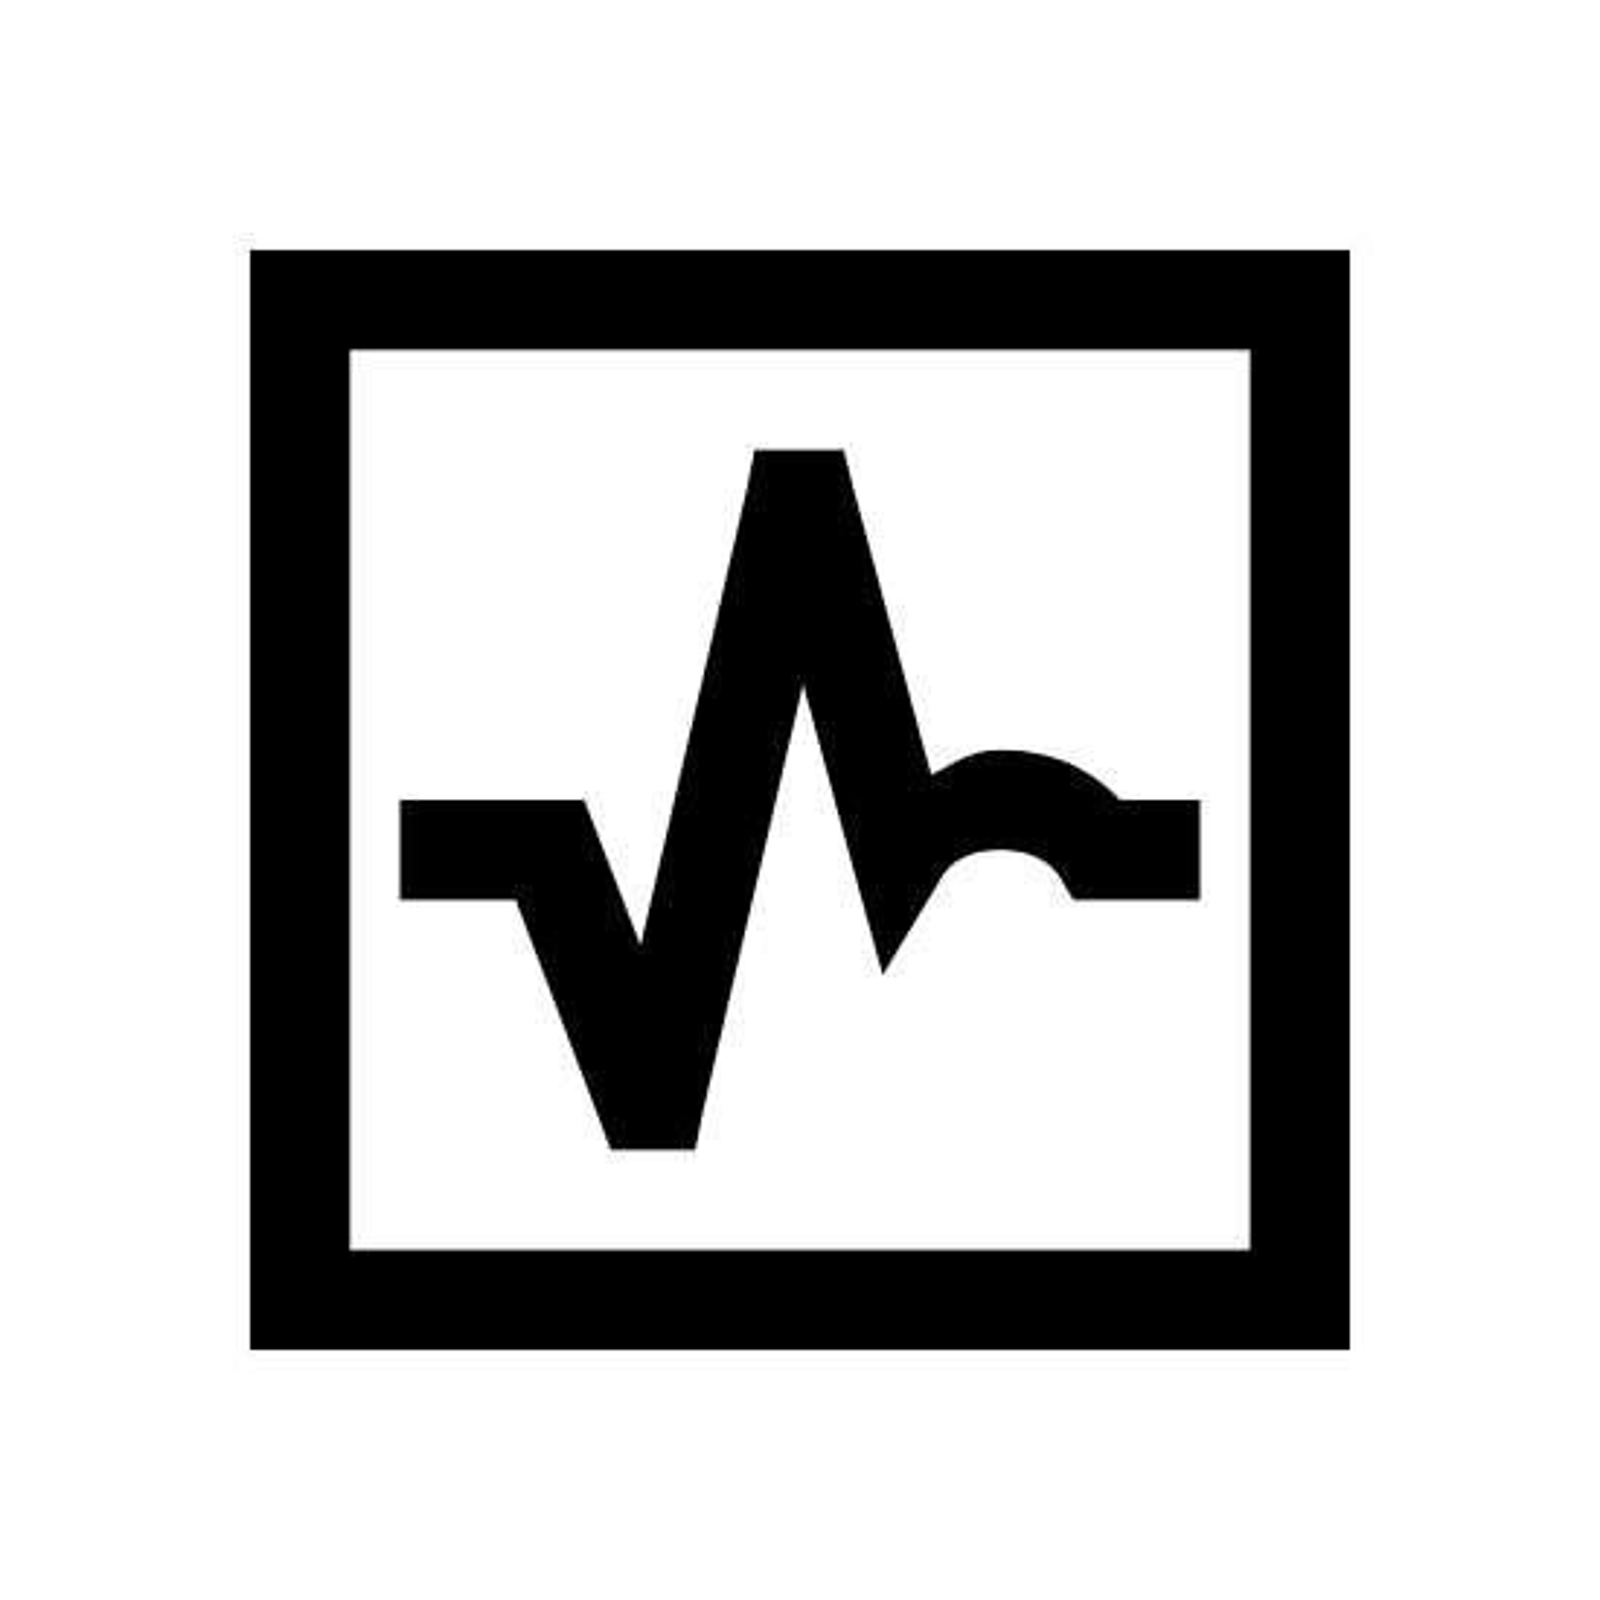 Herz Monitor icon